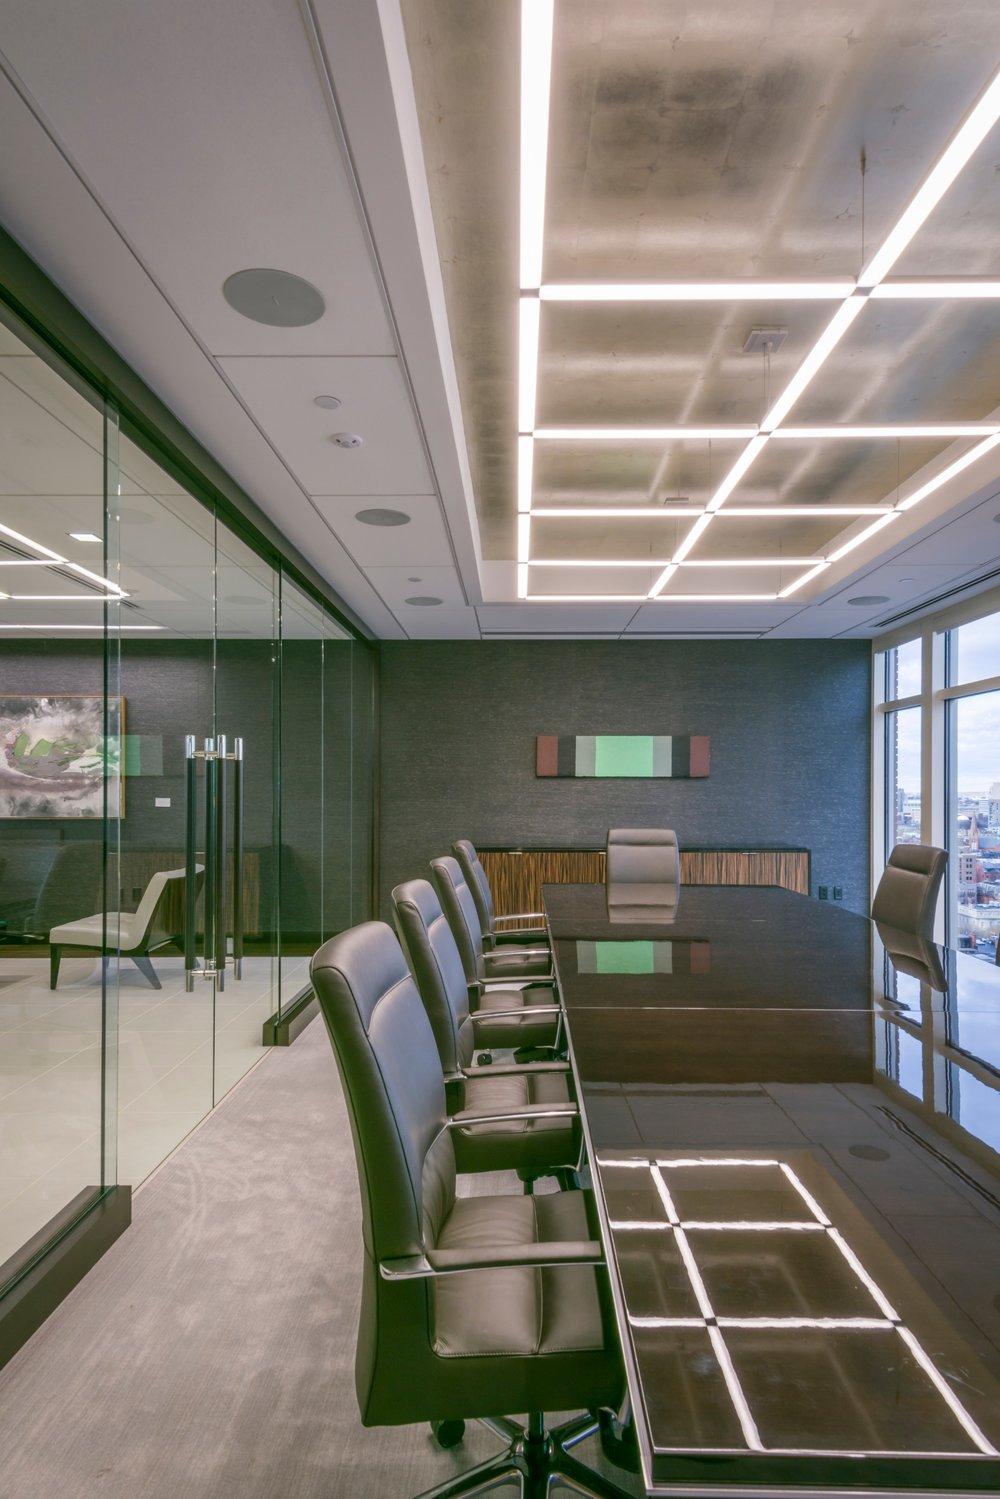 Corderman_Construction_Martignetti_Companies_Interior_Office_Buildout_Boardroom_Light.jpg